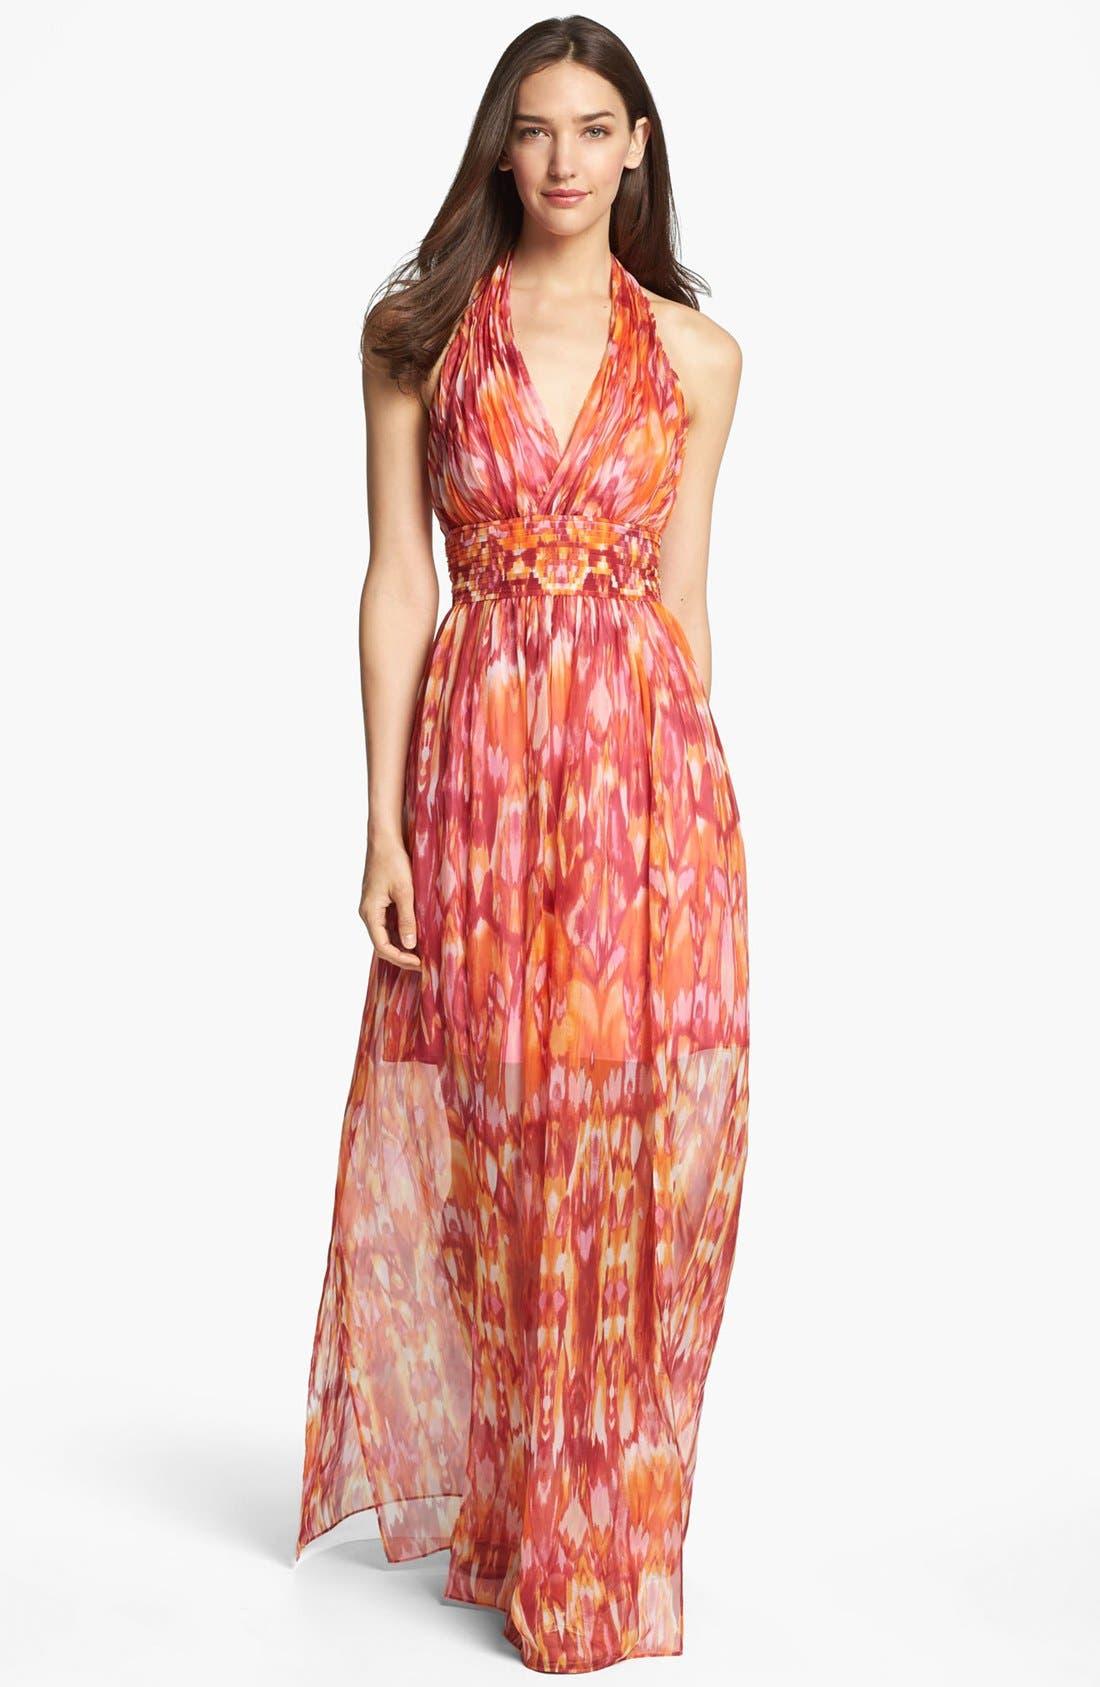 Main Image - Laundry by Shelli Segal 'Sun Shadow' Print Halter Dress